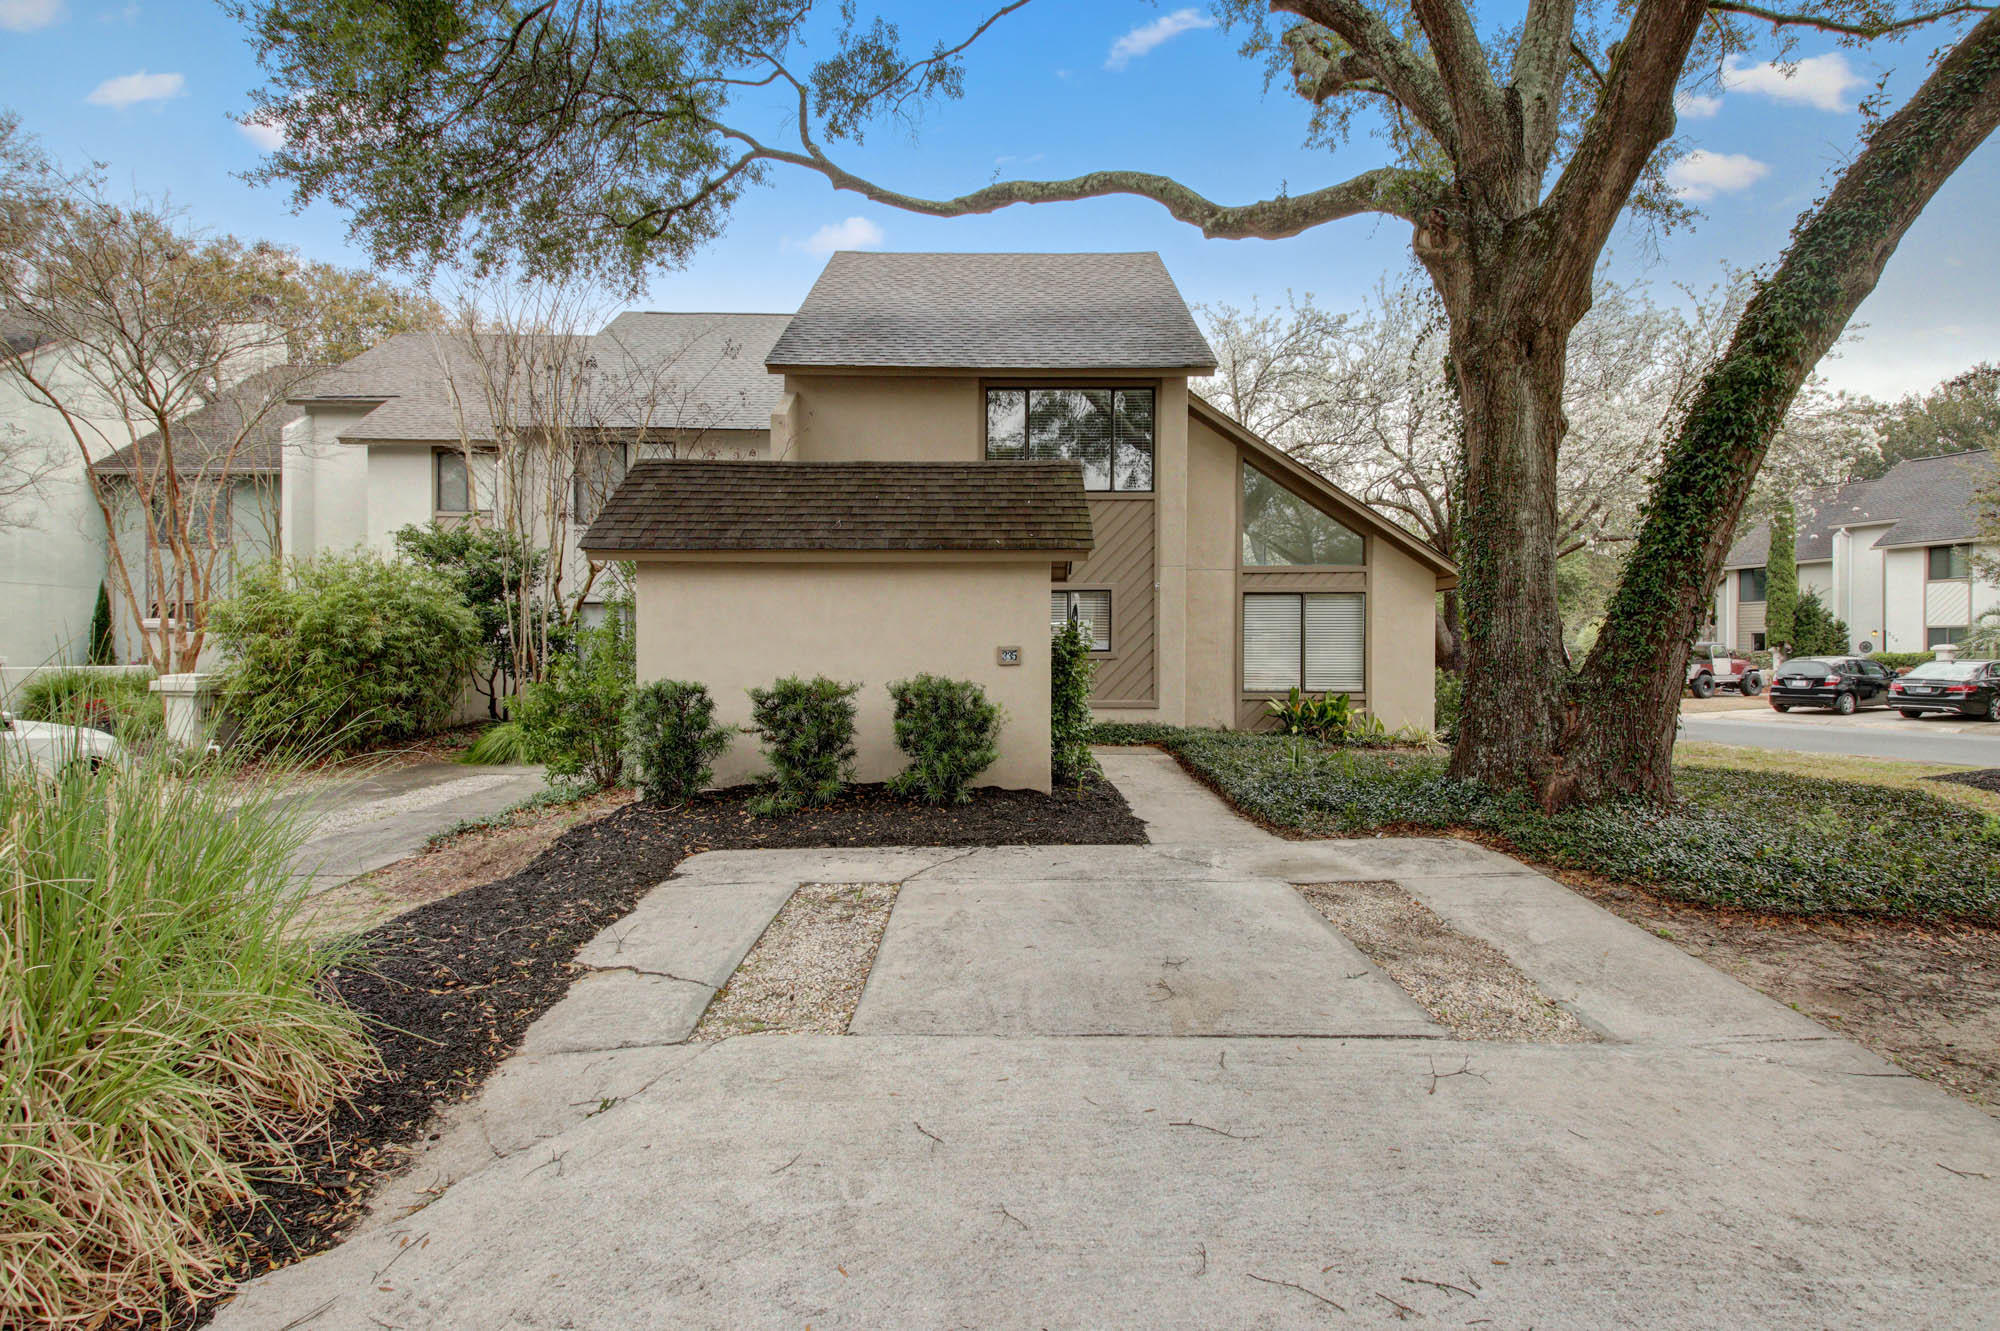 Sandpiper Pointe Homes For Sale - 335 Spoonbill, Mount Pleasant, SC - 23